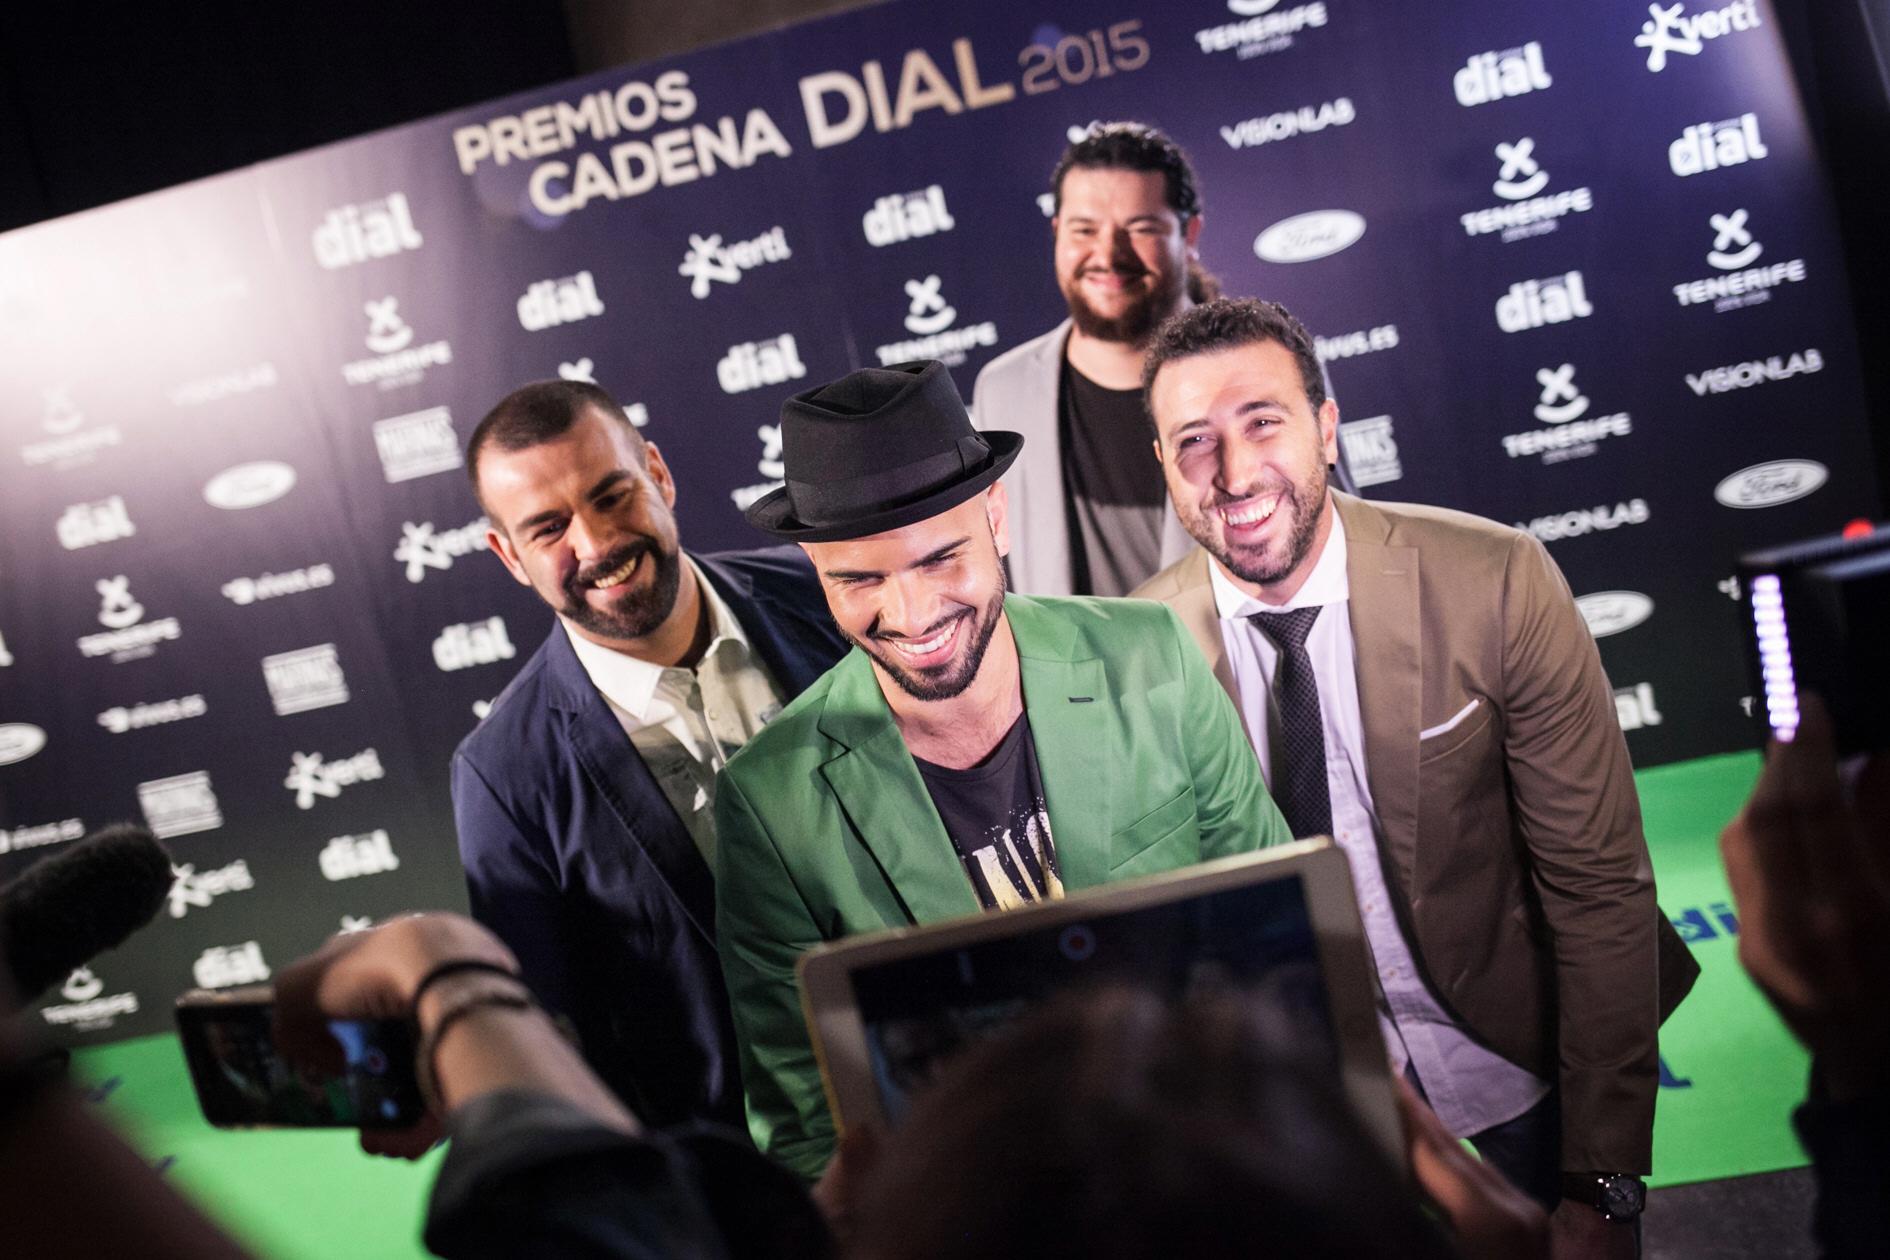 Premios Cadena Dial. / ANDRÉS GUTIÉRREZ